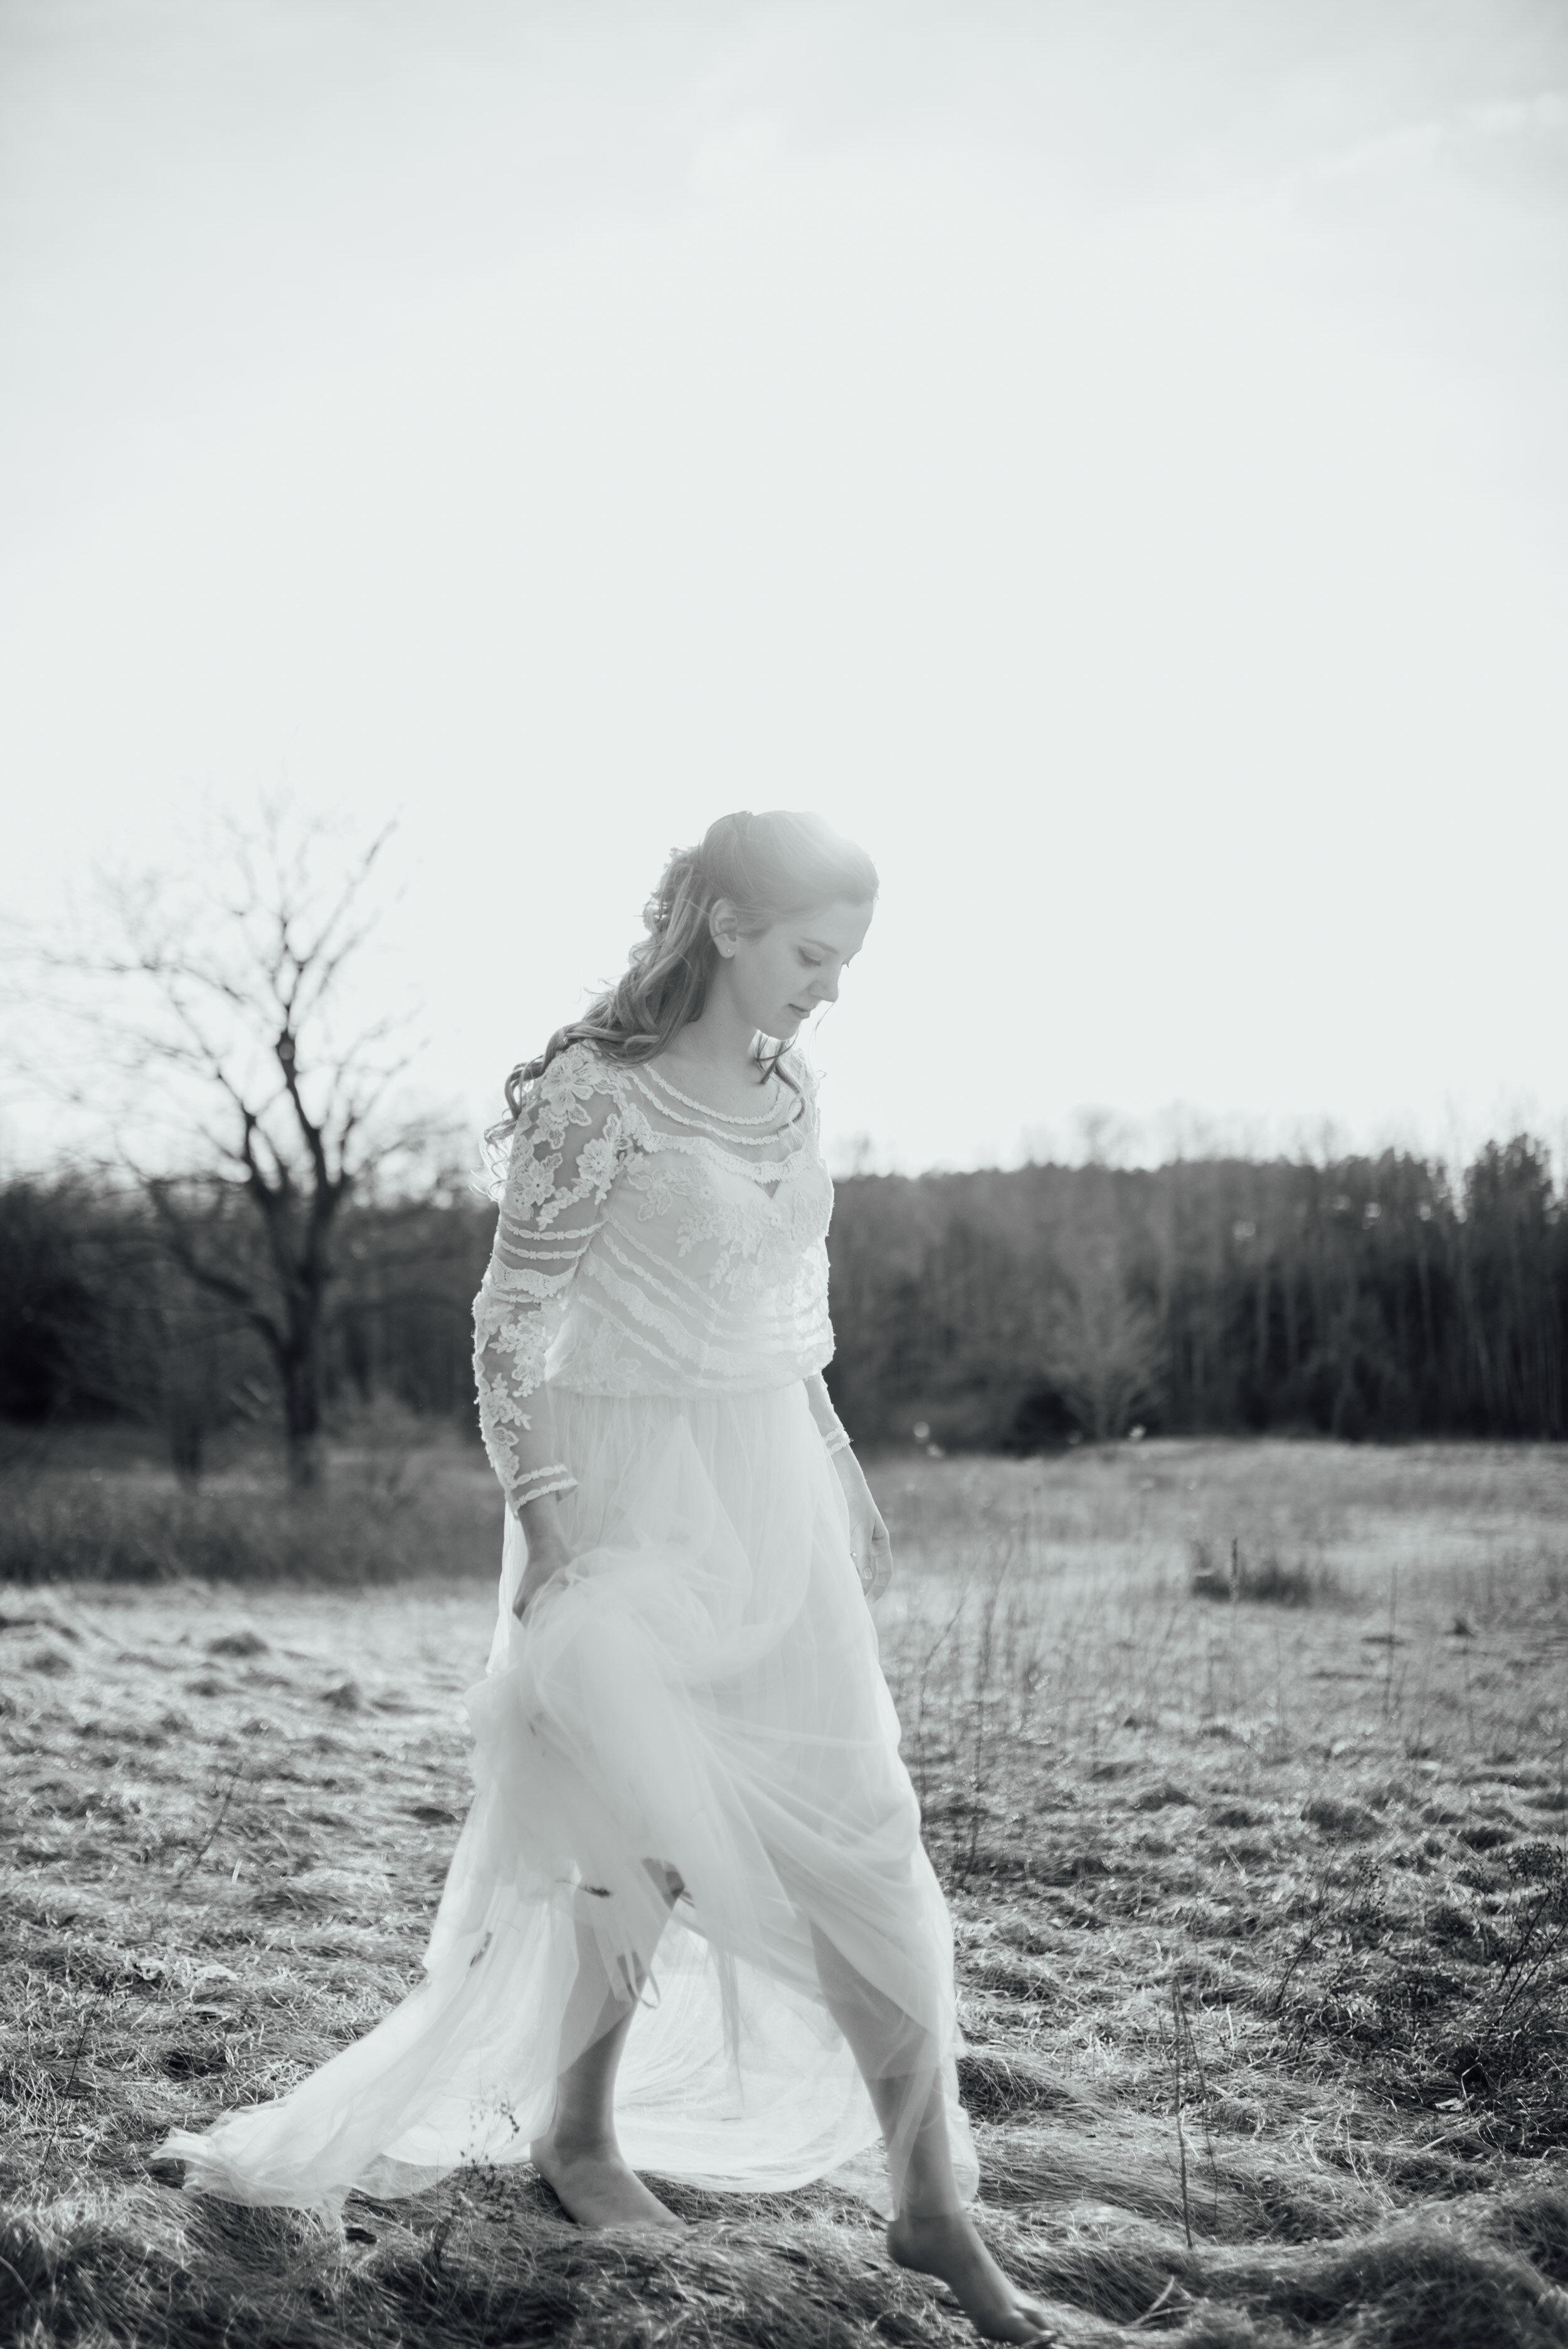 cleland-fine-art-wedding-photography-15.jpg